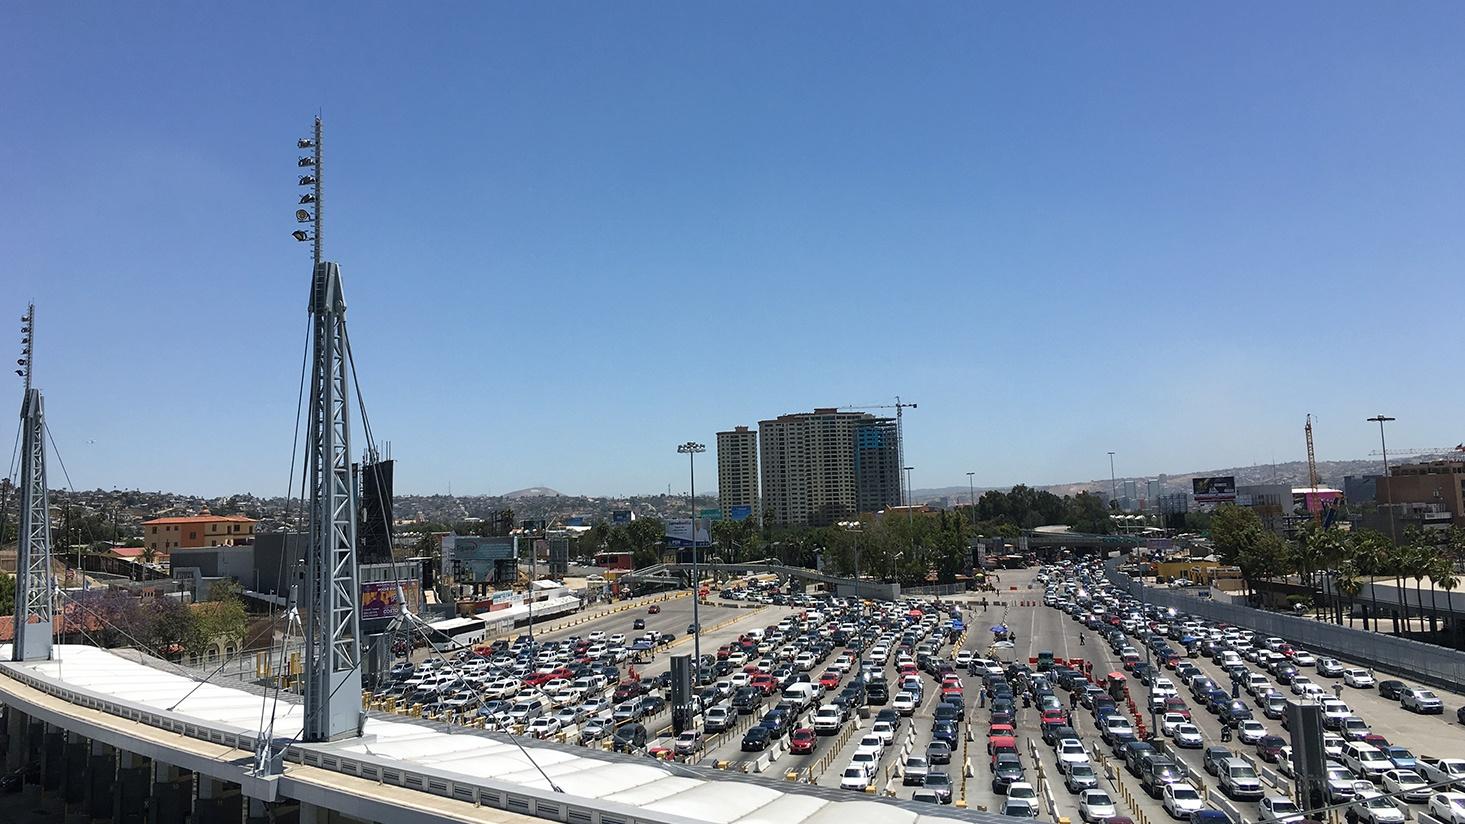 Regency works with US government to better illuminate San Ysidro-Tijuana border